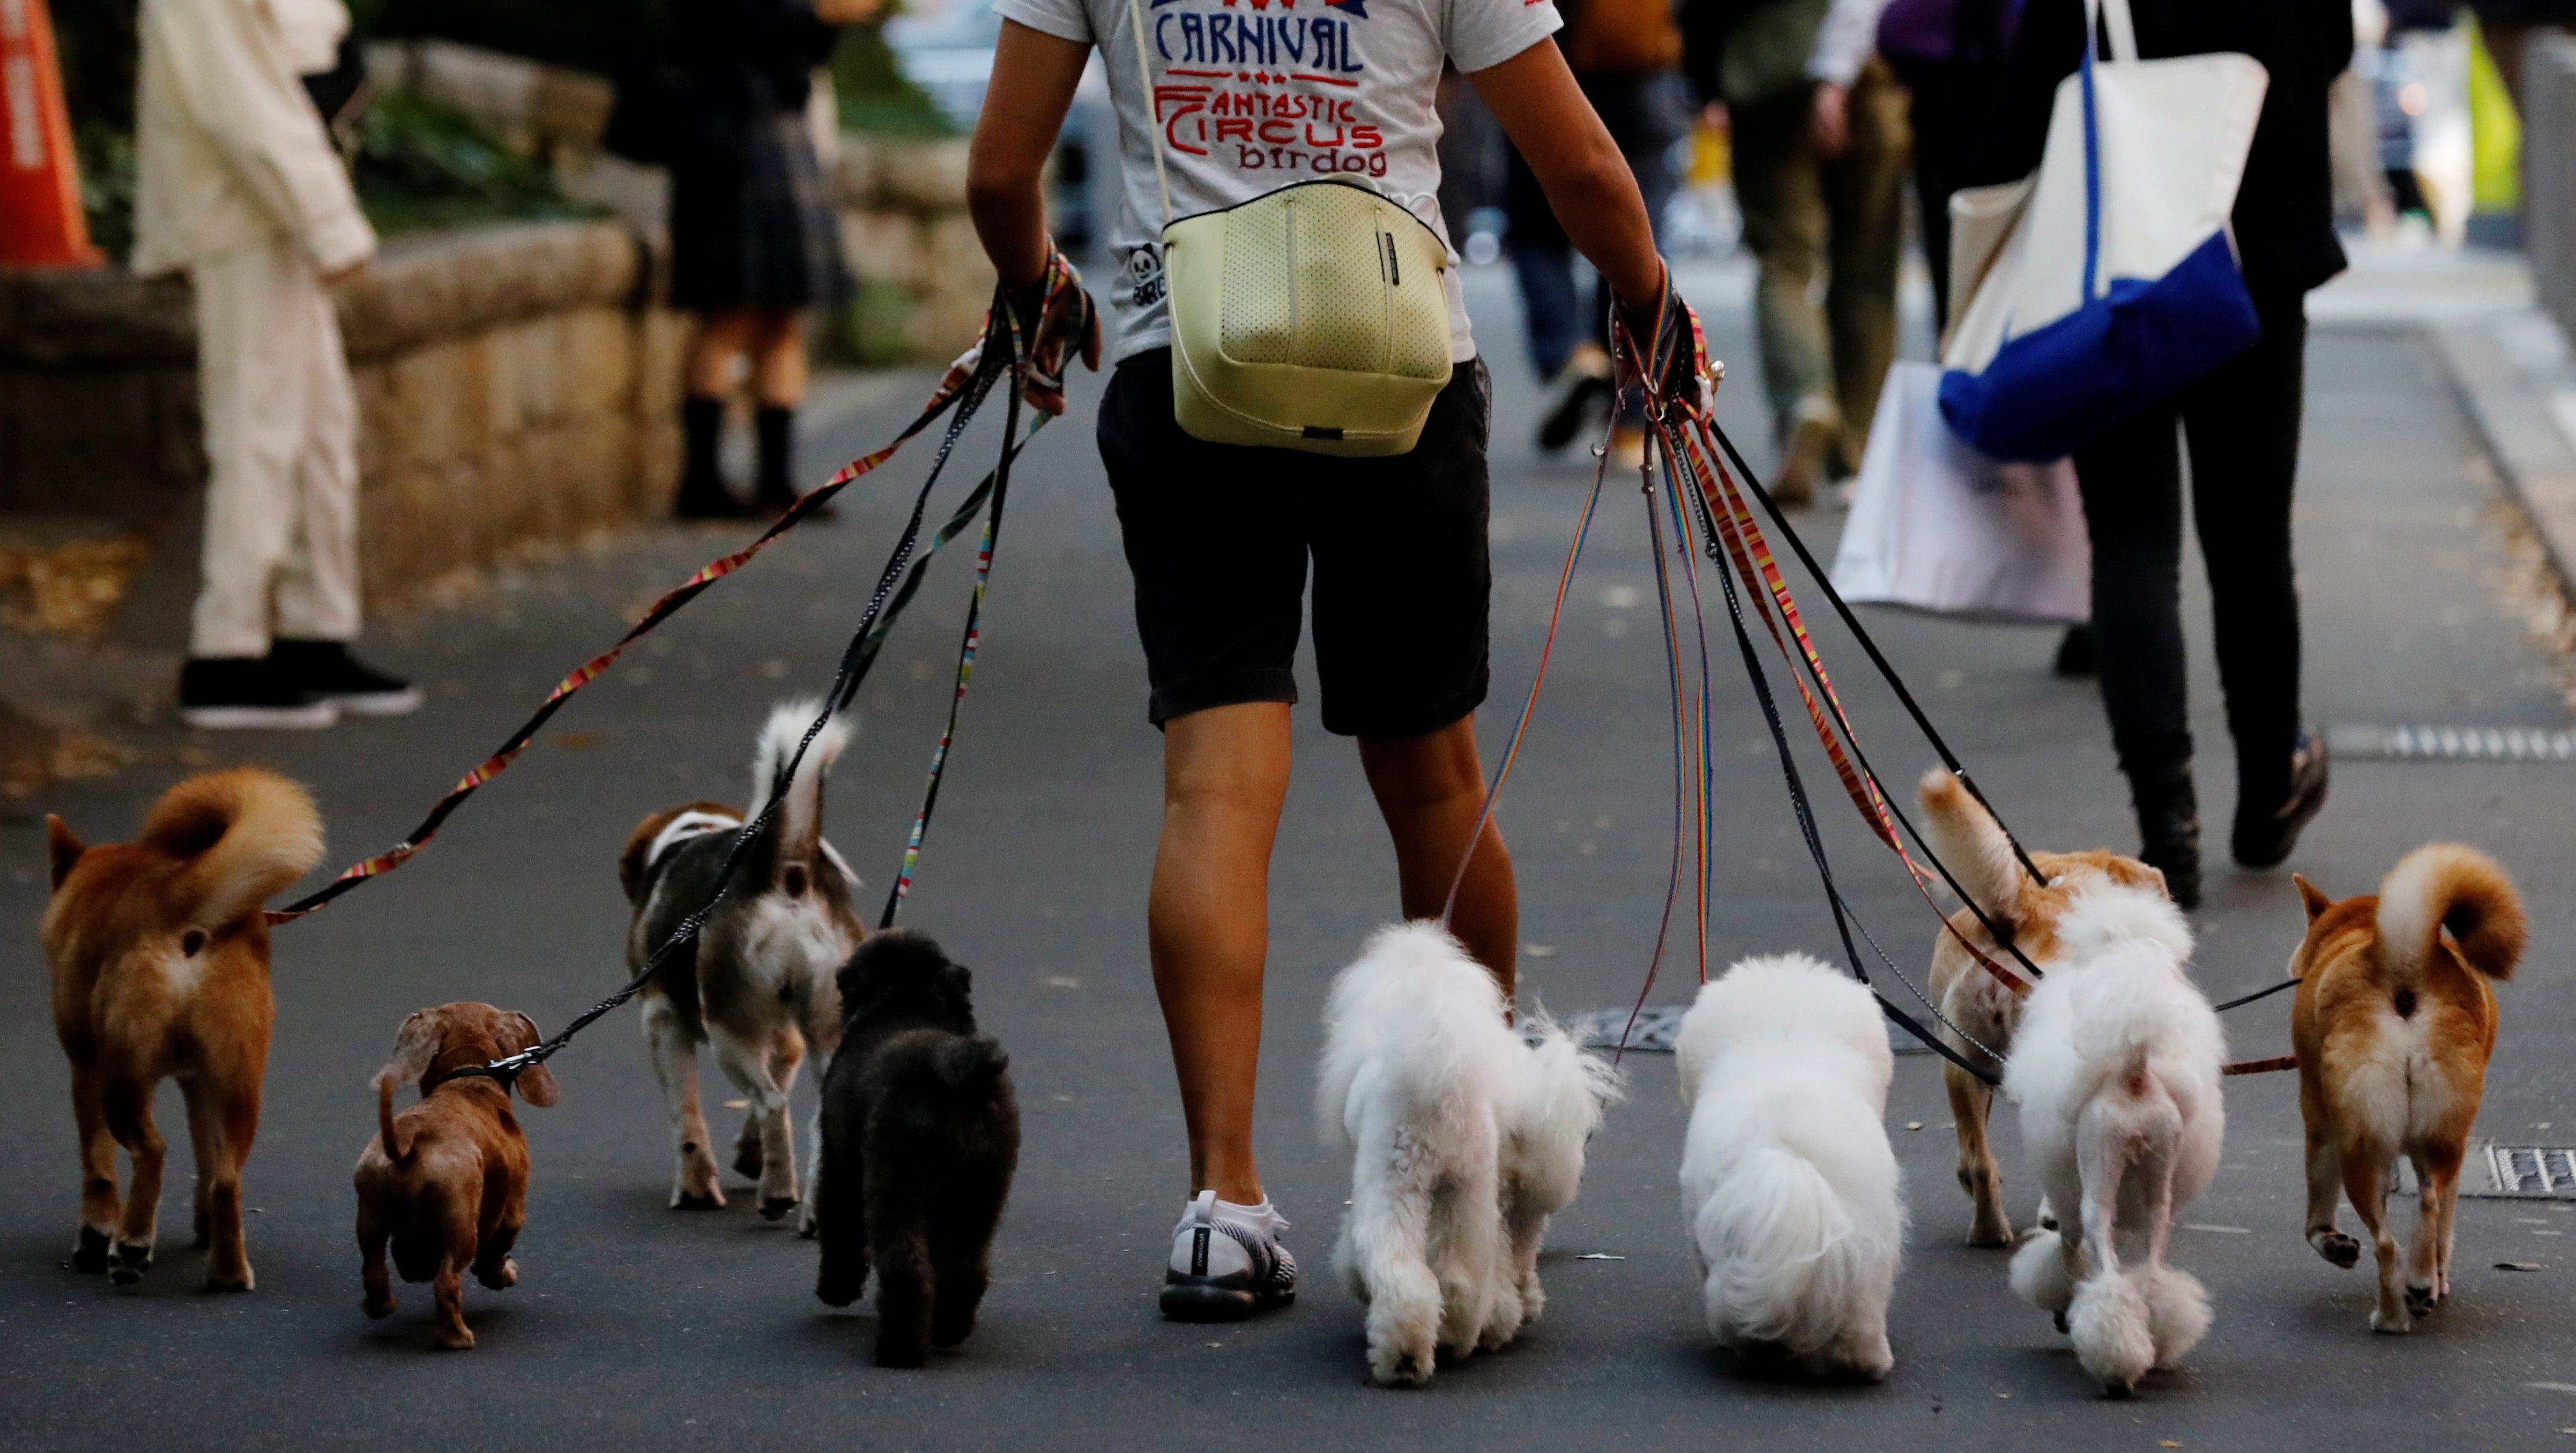 Rover, a dog-walking app, is now worth $1.35 billion — Quartz